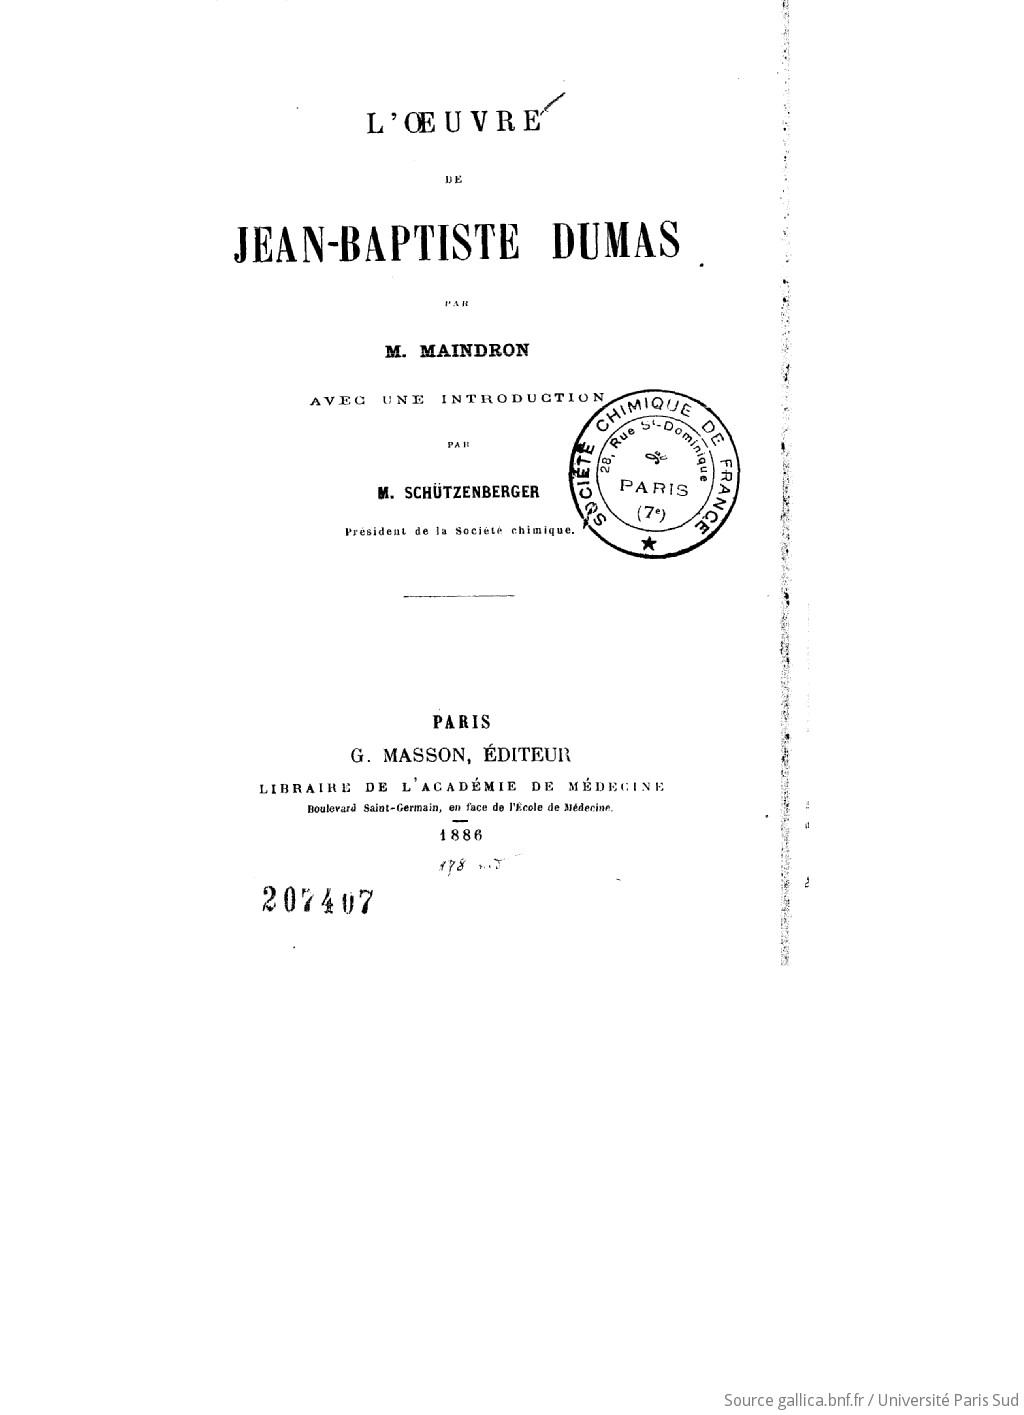 L'oeuvre de Jean-Baptiste Dumas